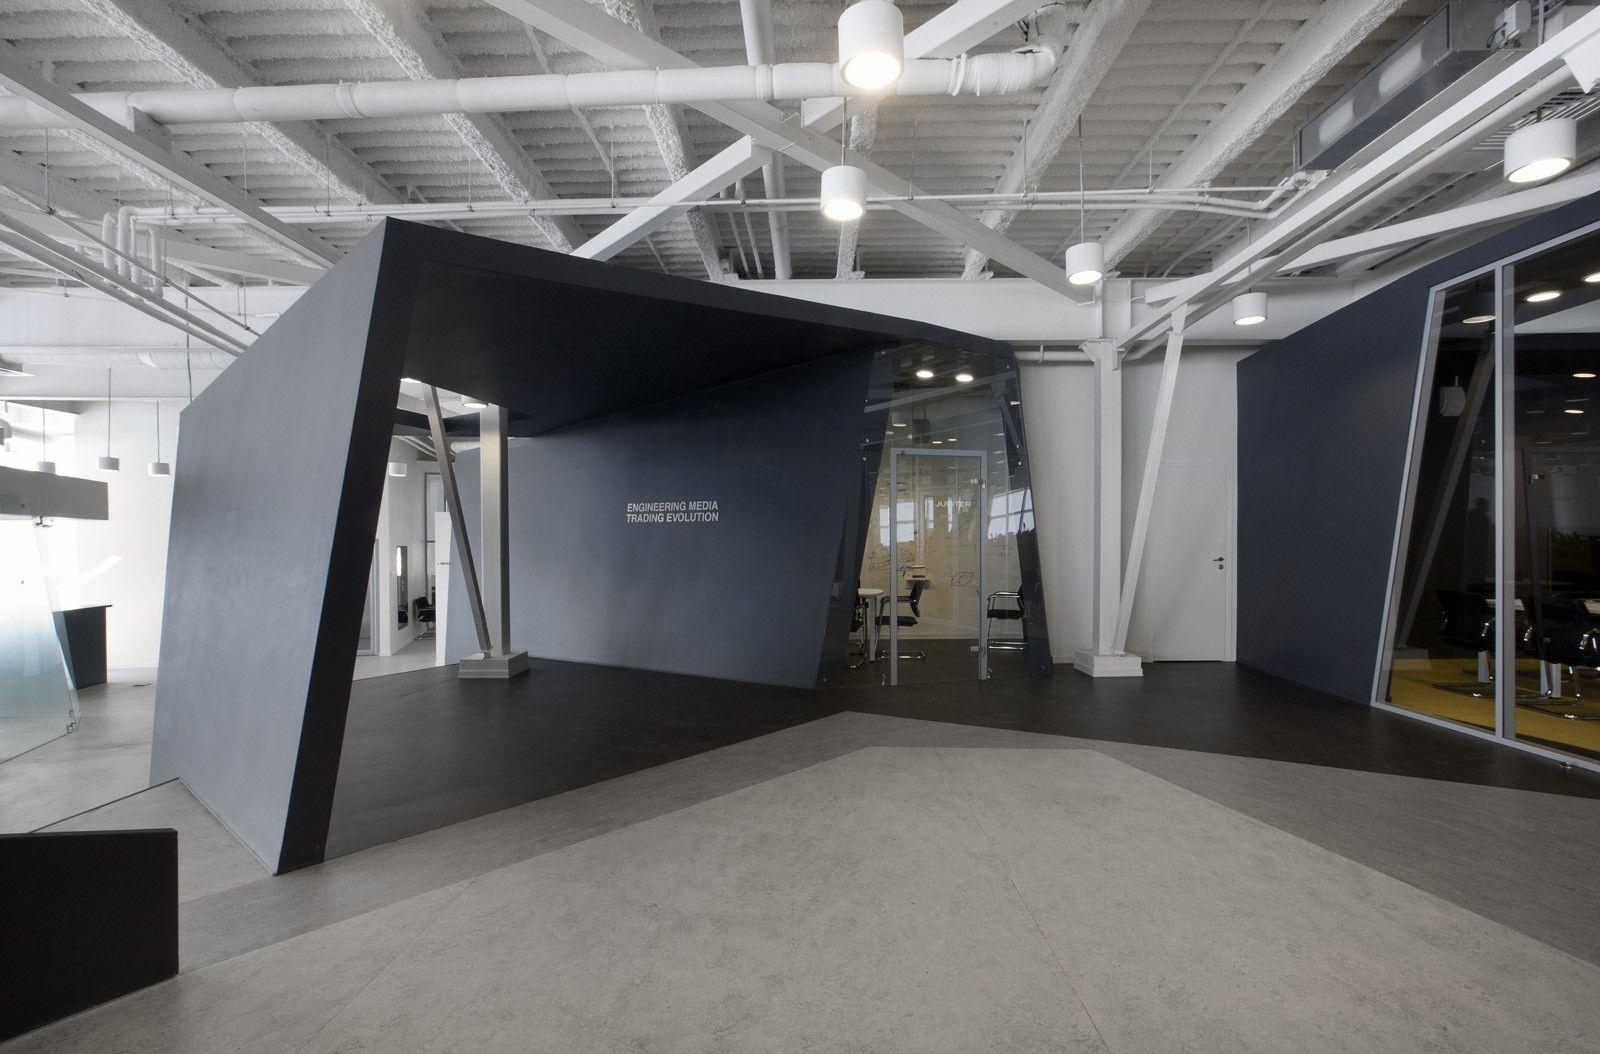 Color art office interiors - Gallery Of Iponweb Company Office Za Bor Architects 2 Interior Officeoffice Artoffice